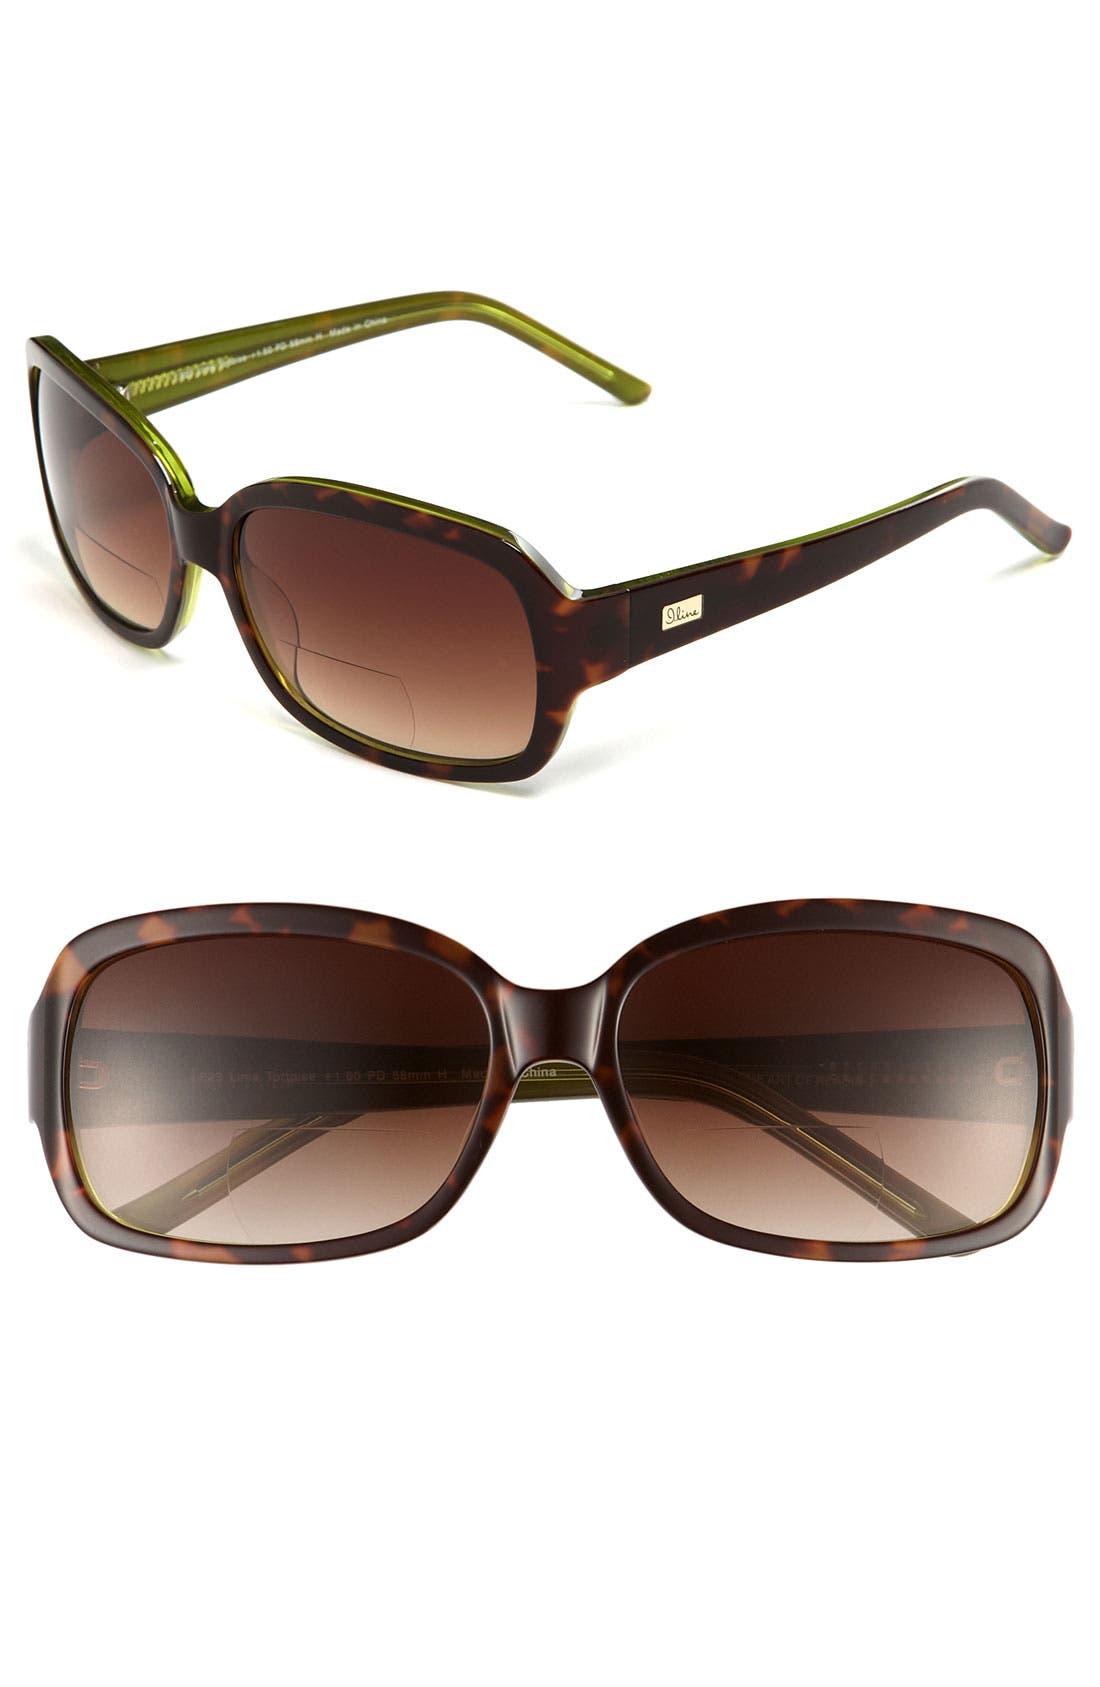 Alternate Image 1 Selected - I Line Eyewear 'Lime Tortoise' 60mm Reading Sunglasses